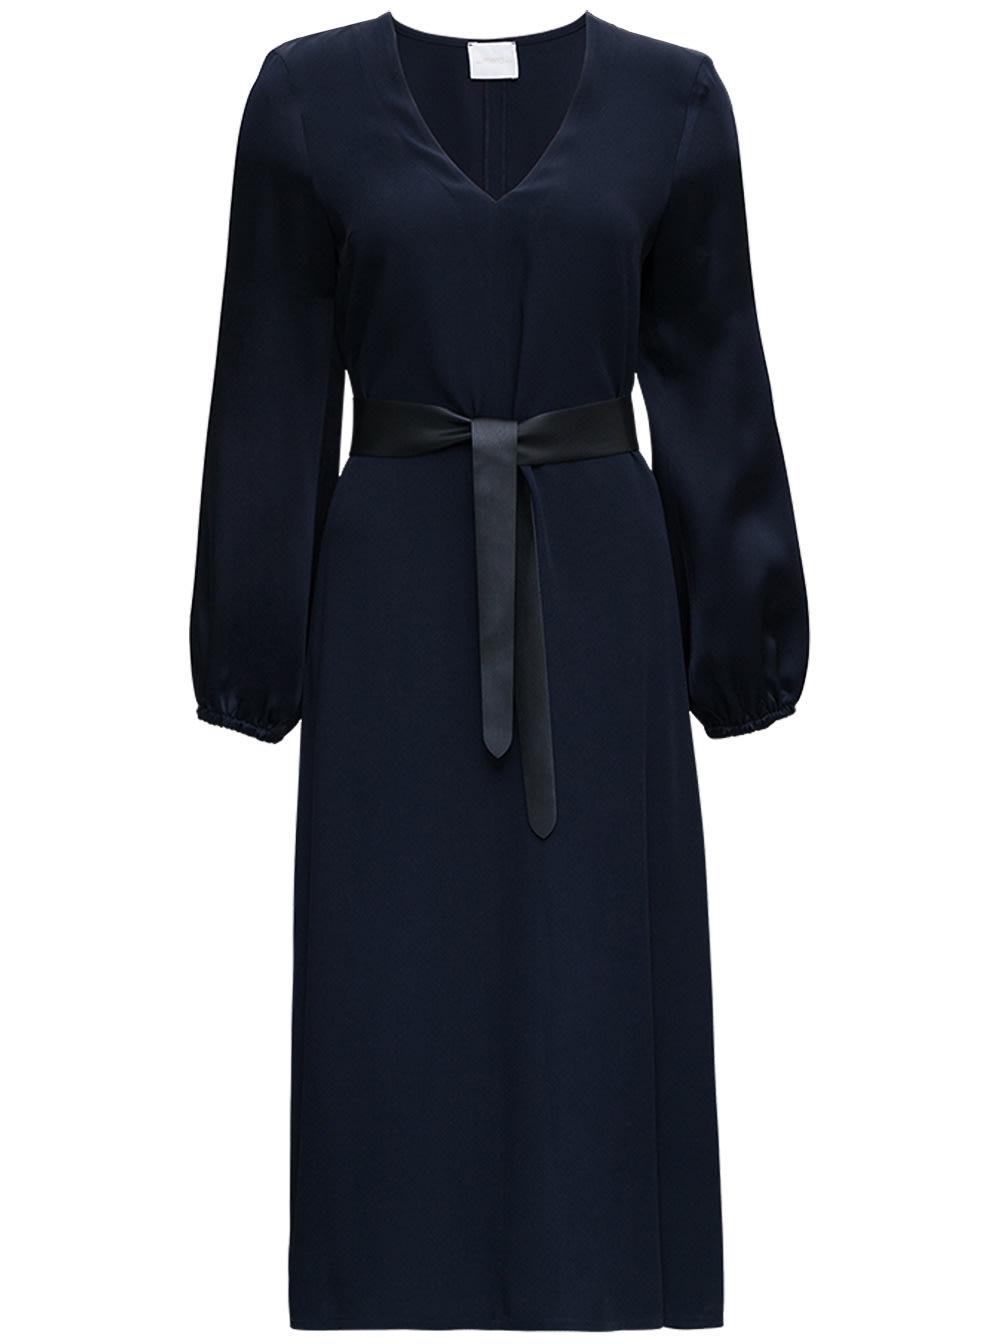 Blue Satin Dress With Belt